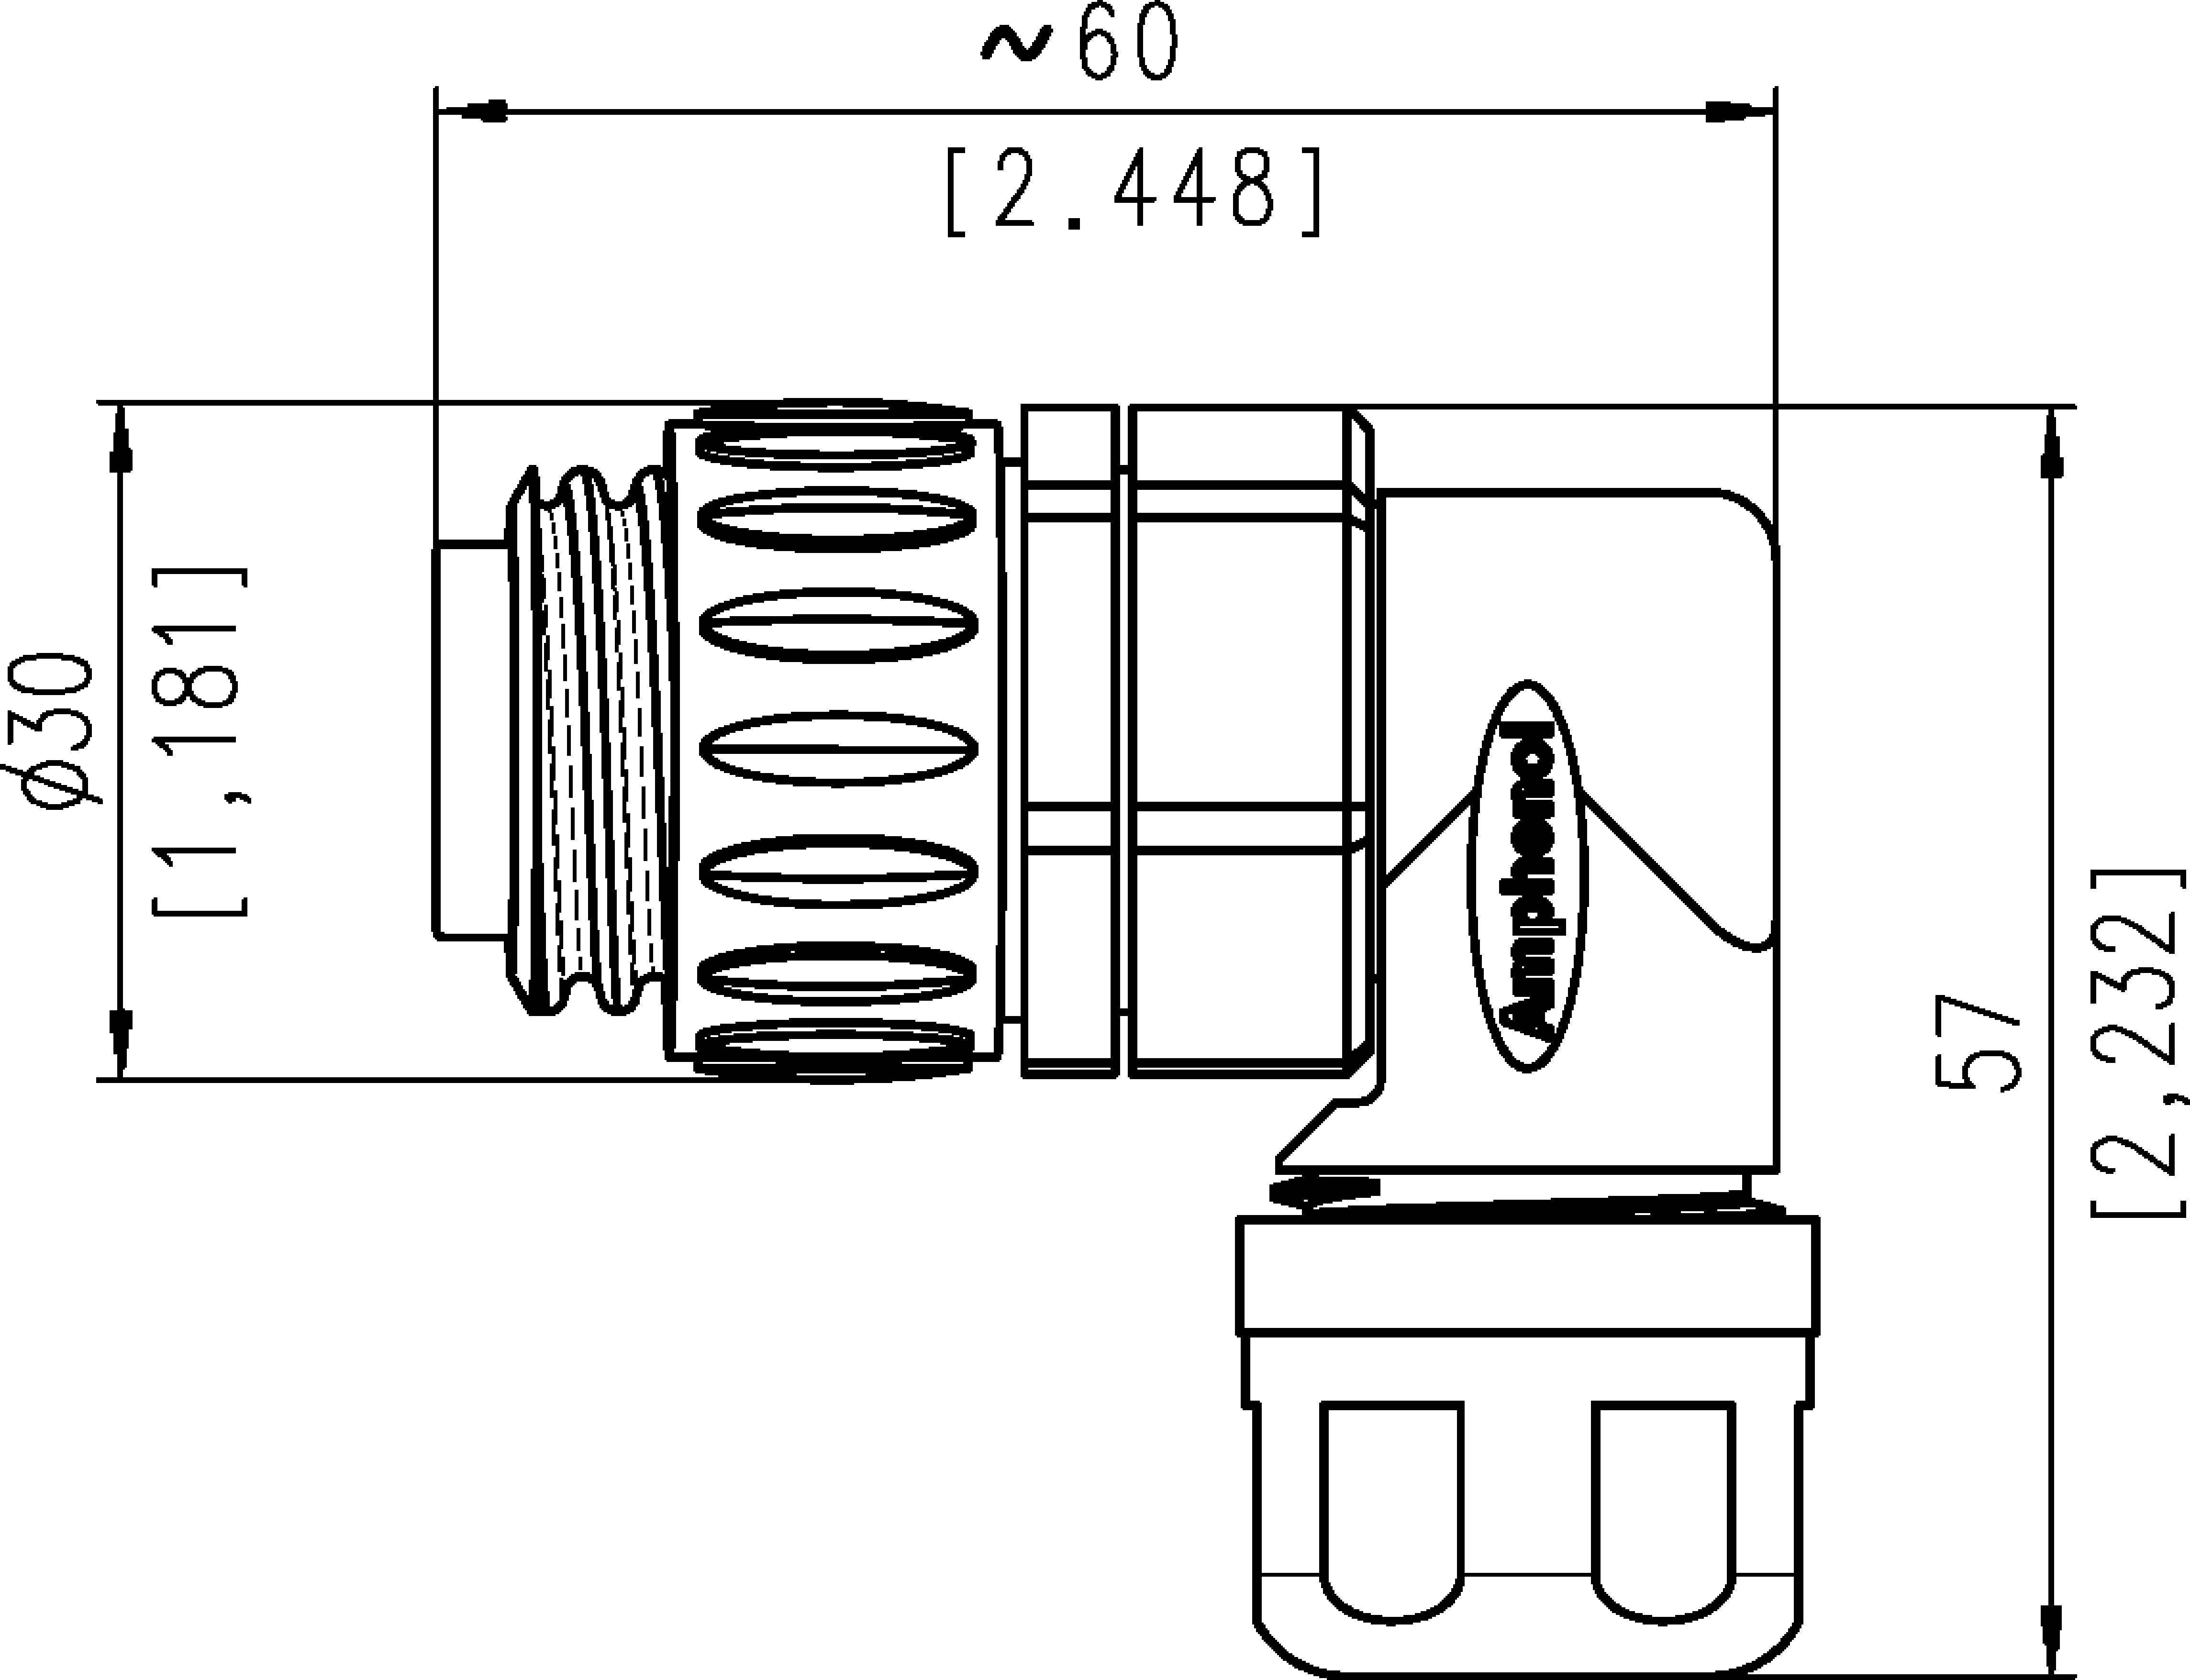 Amphenol C016 30F006 100 12 IP67 (v zablokovanom stave), polyamid 6.6, pólů + PE, 1 ks